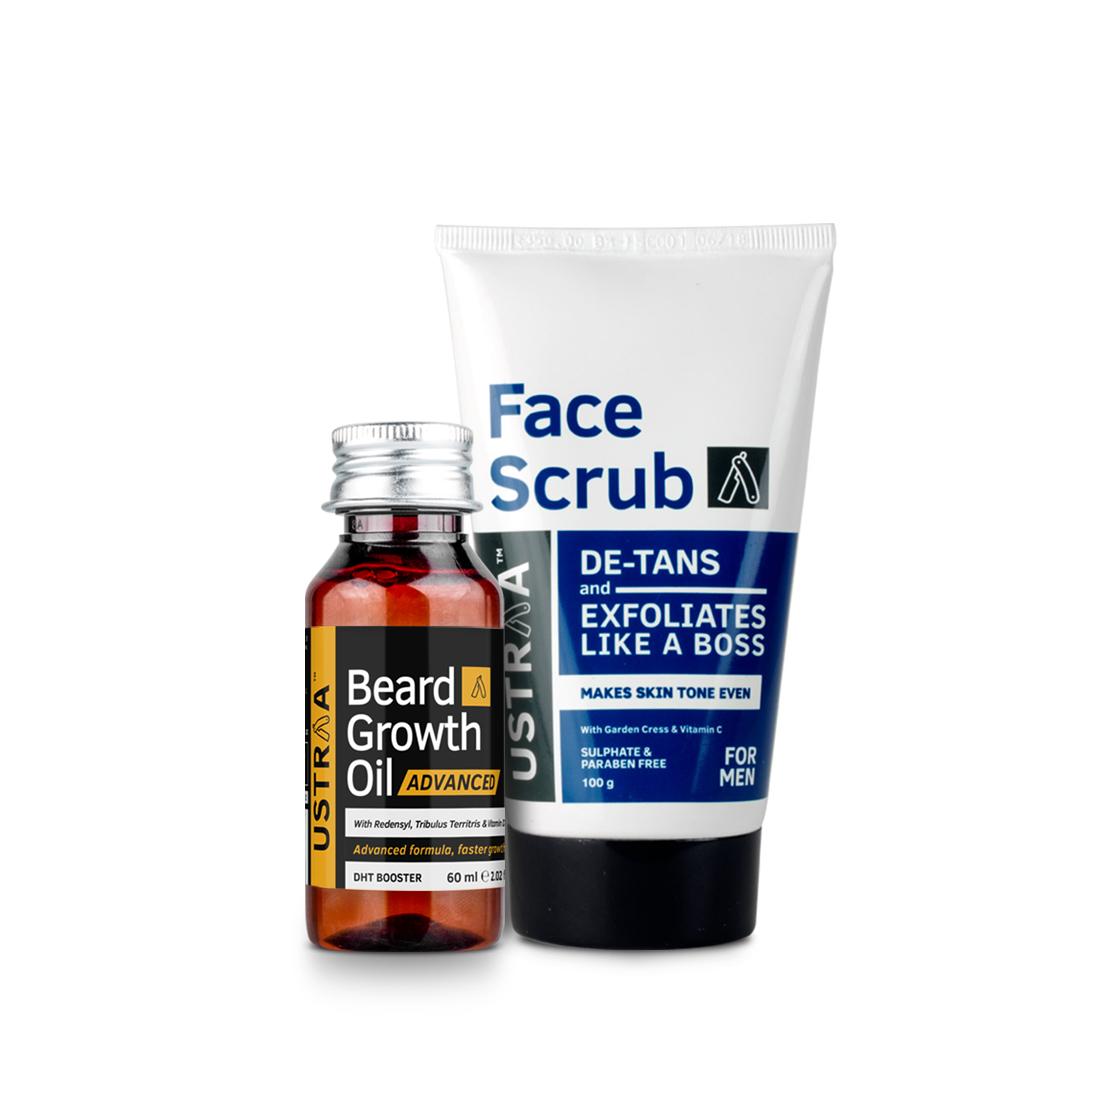 Beard Growth Oil- Advanced & Face Scrub for de-Tan